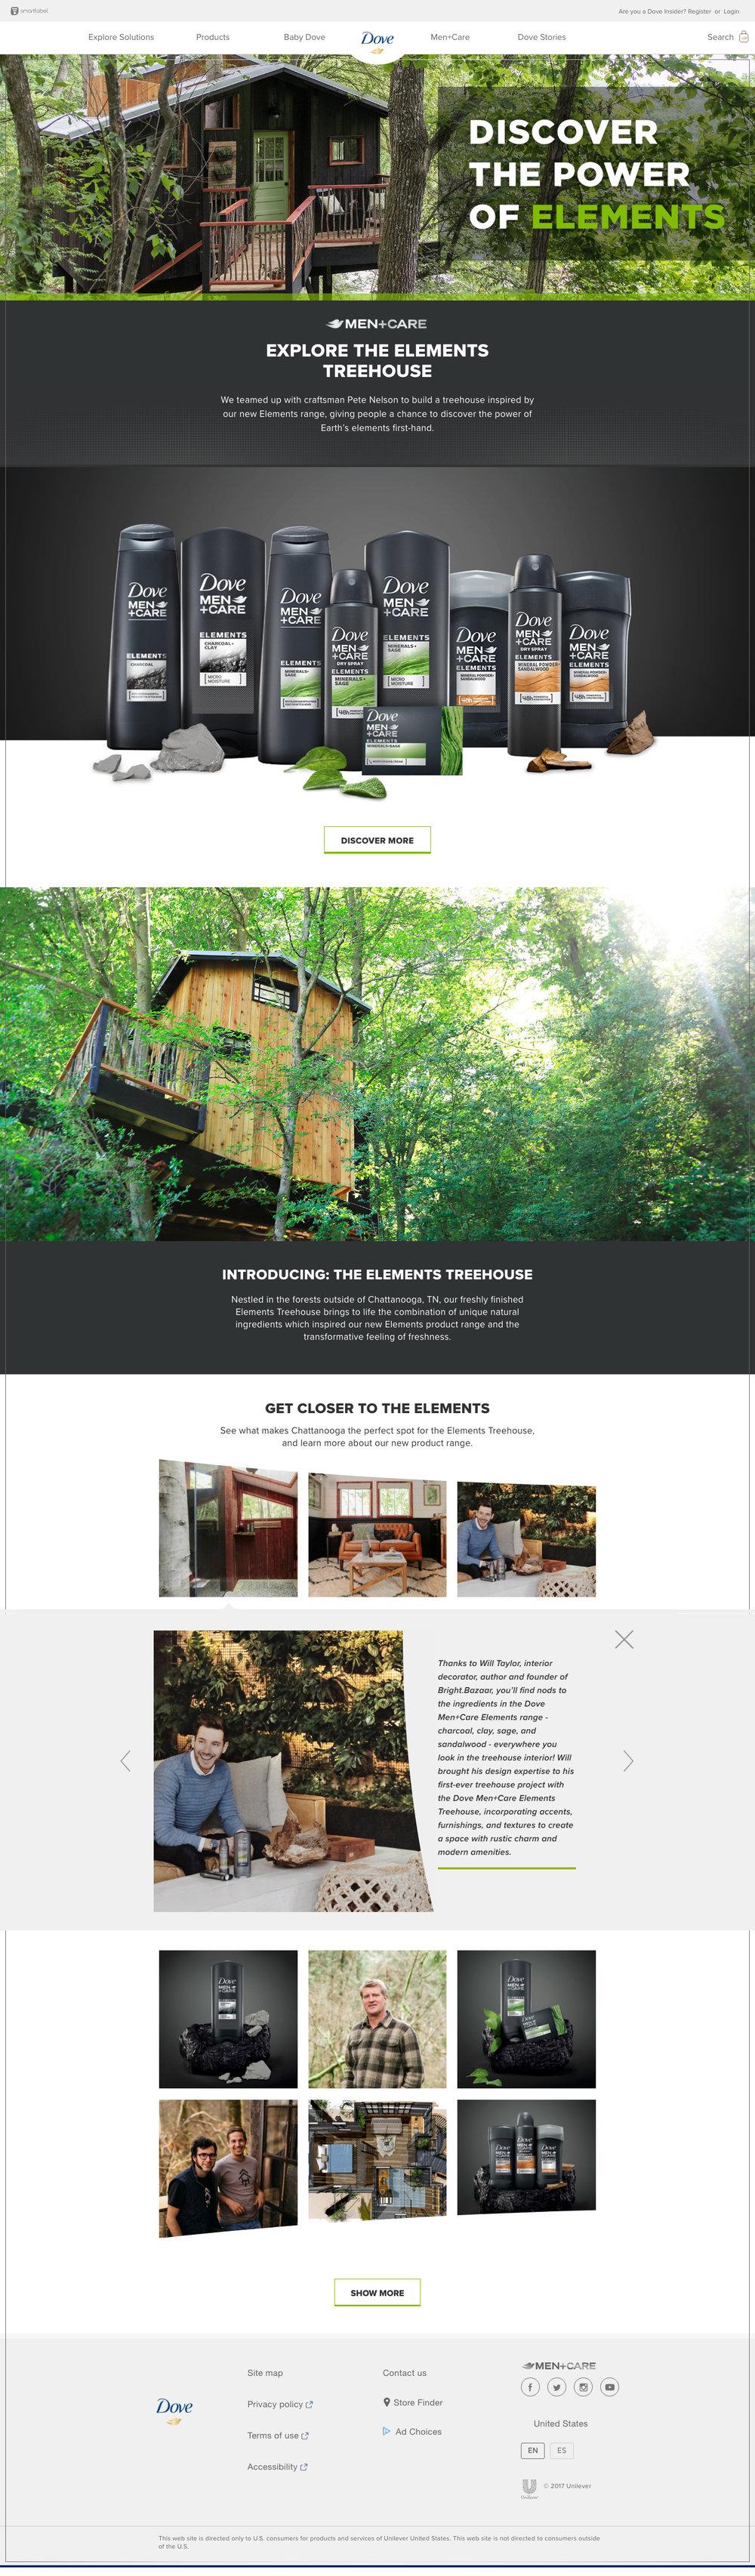 treehouse-psdi.jpg